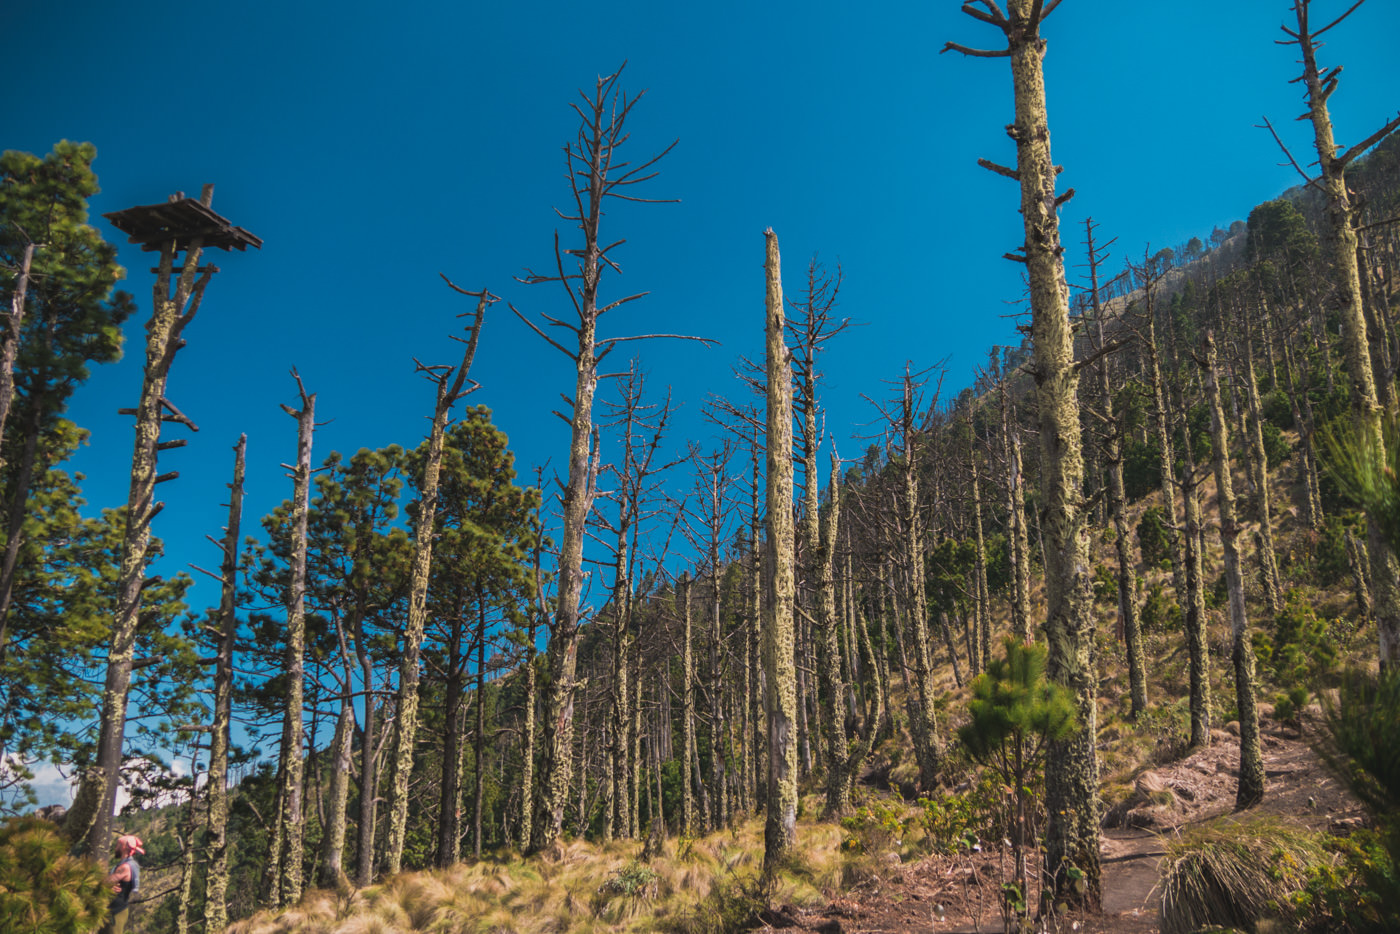 Wald am Fuße des Vulkans Acatenango